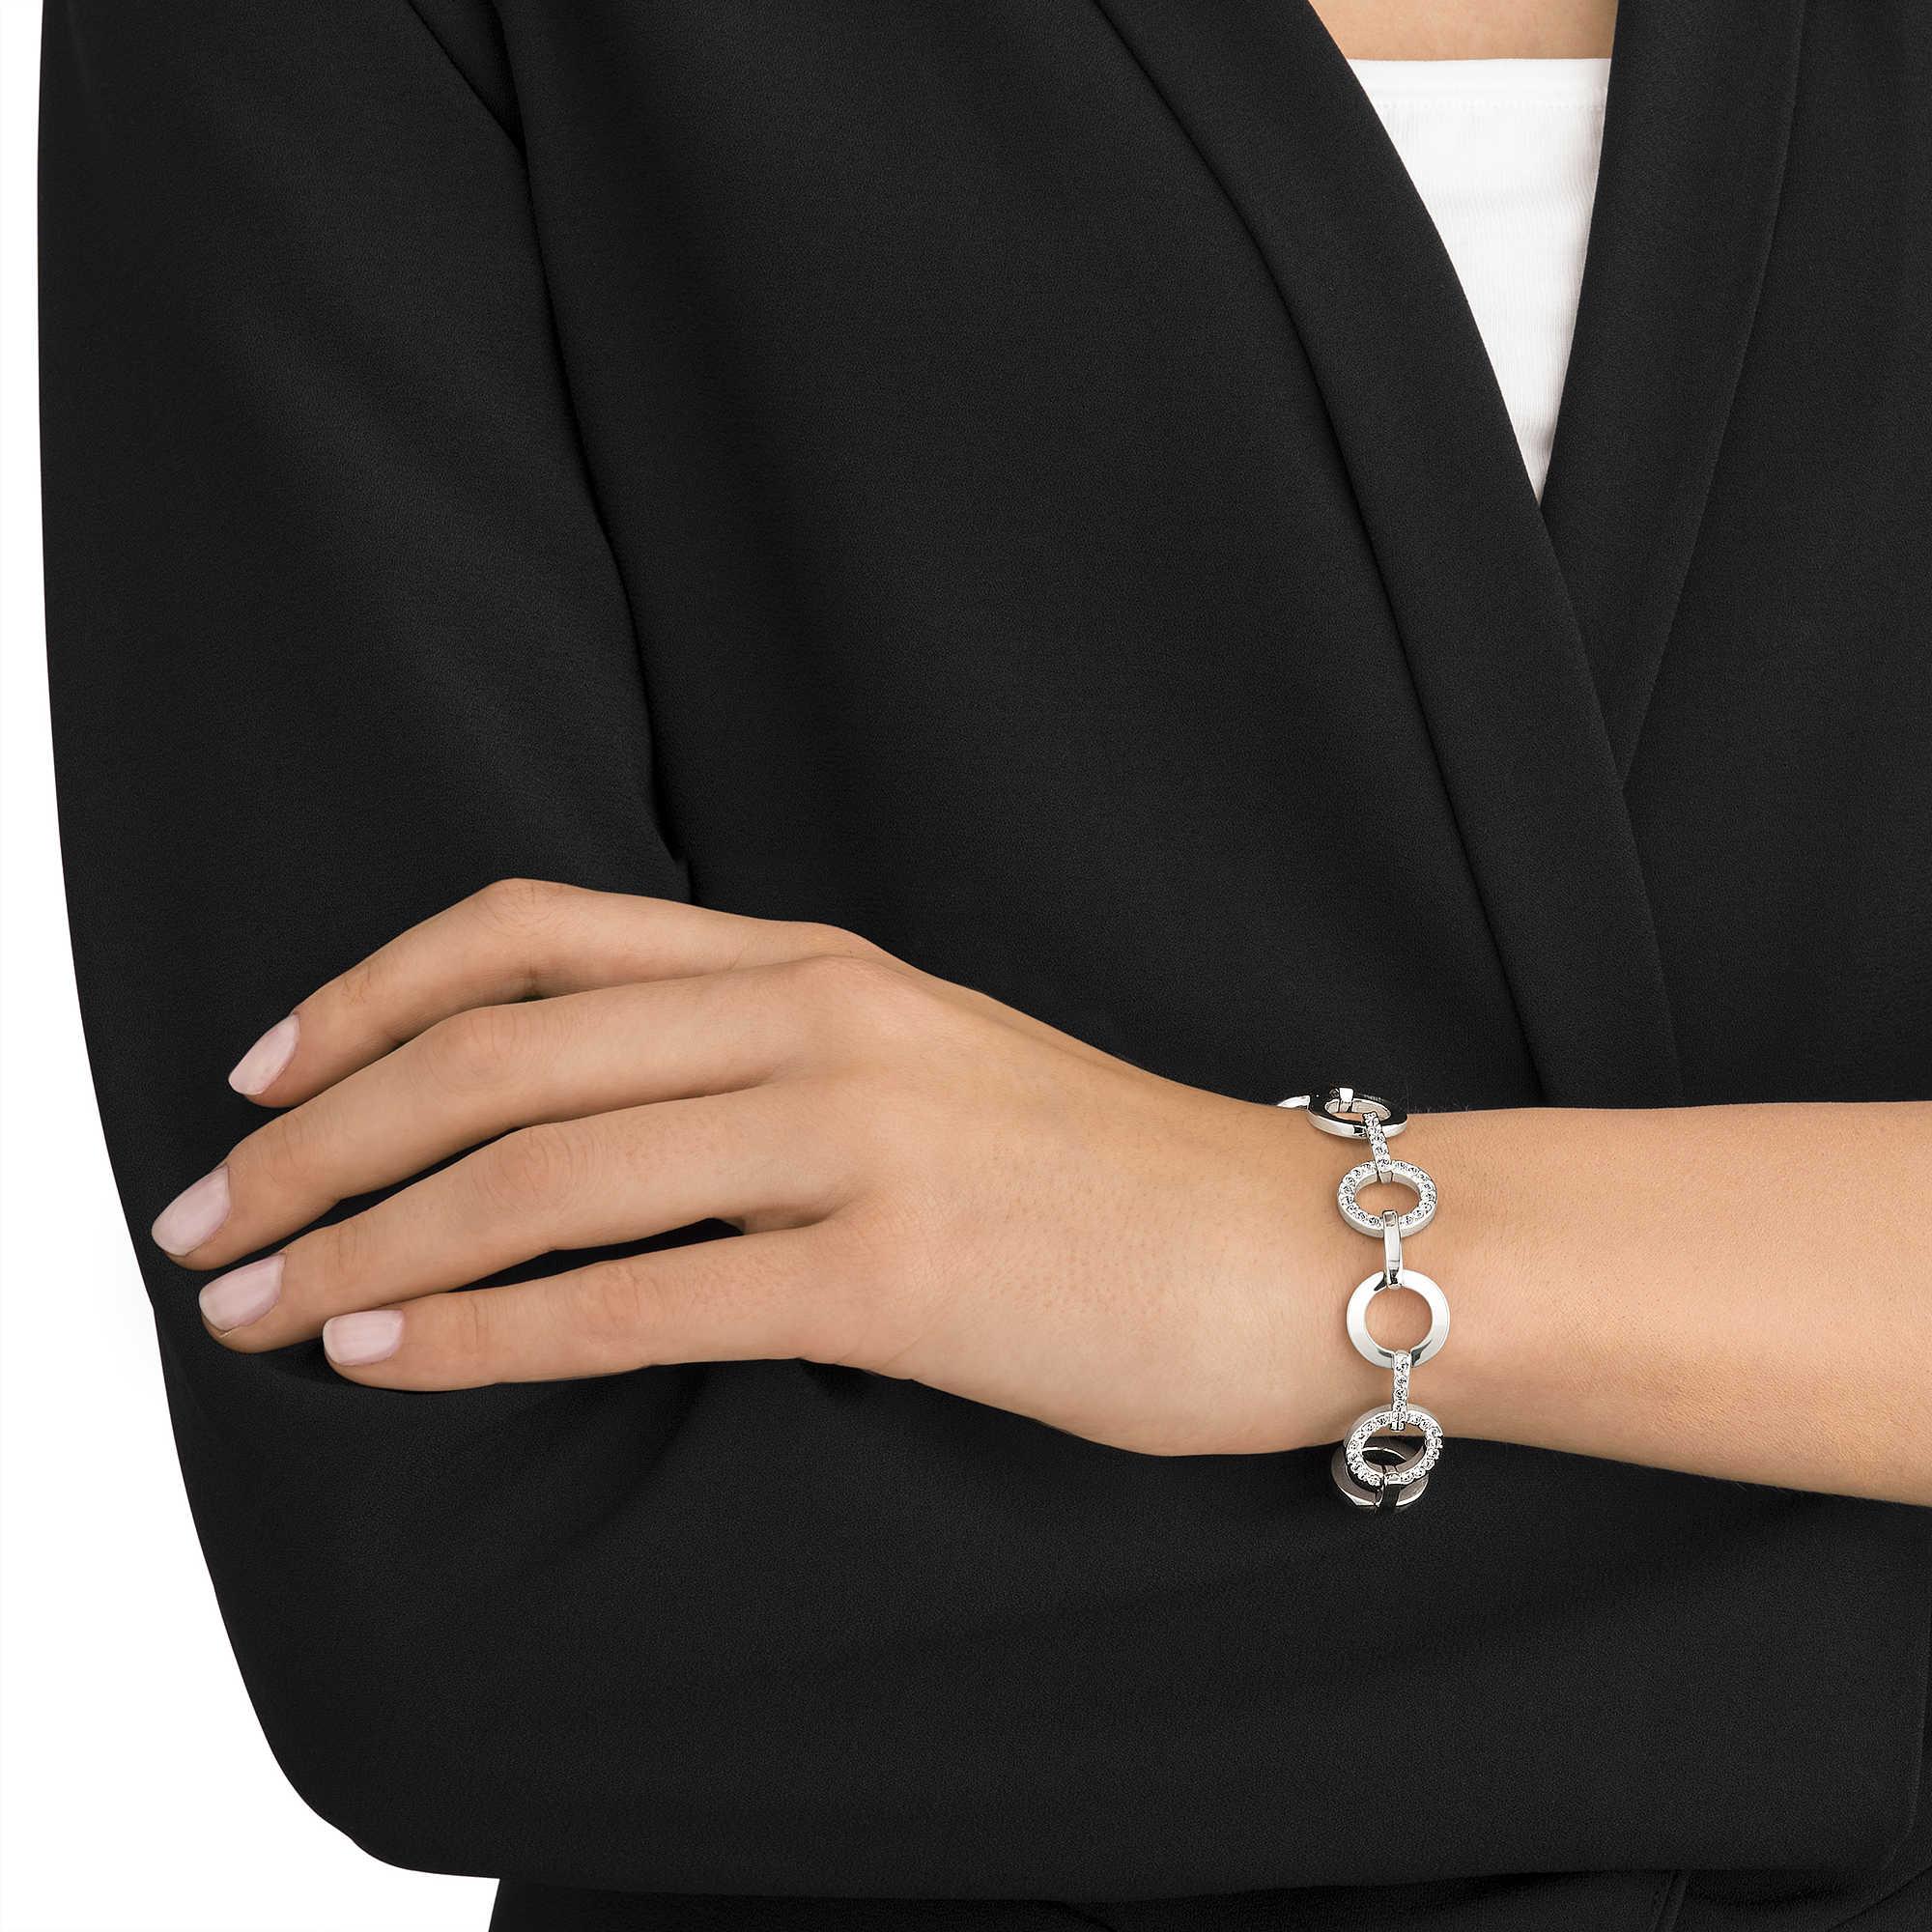 ee0d31b5c bracelet woman jewellery Swarovski Circle 678223 bracelets Swarovski